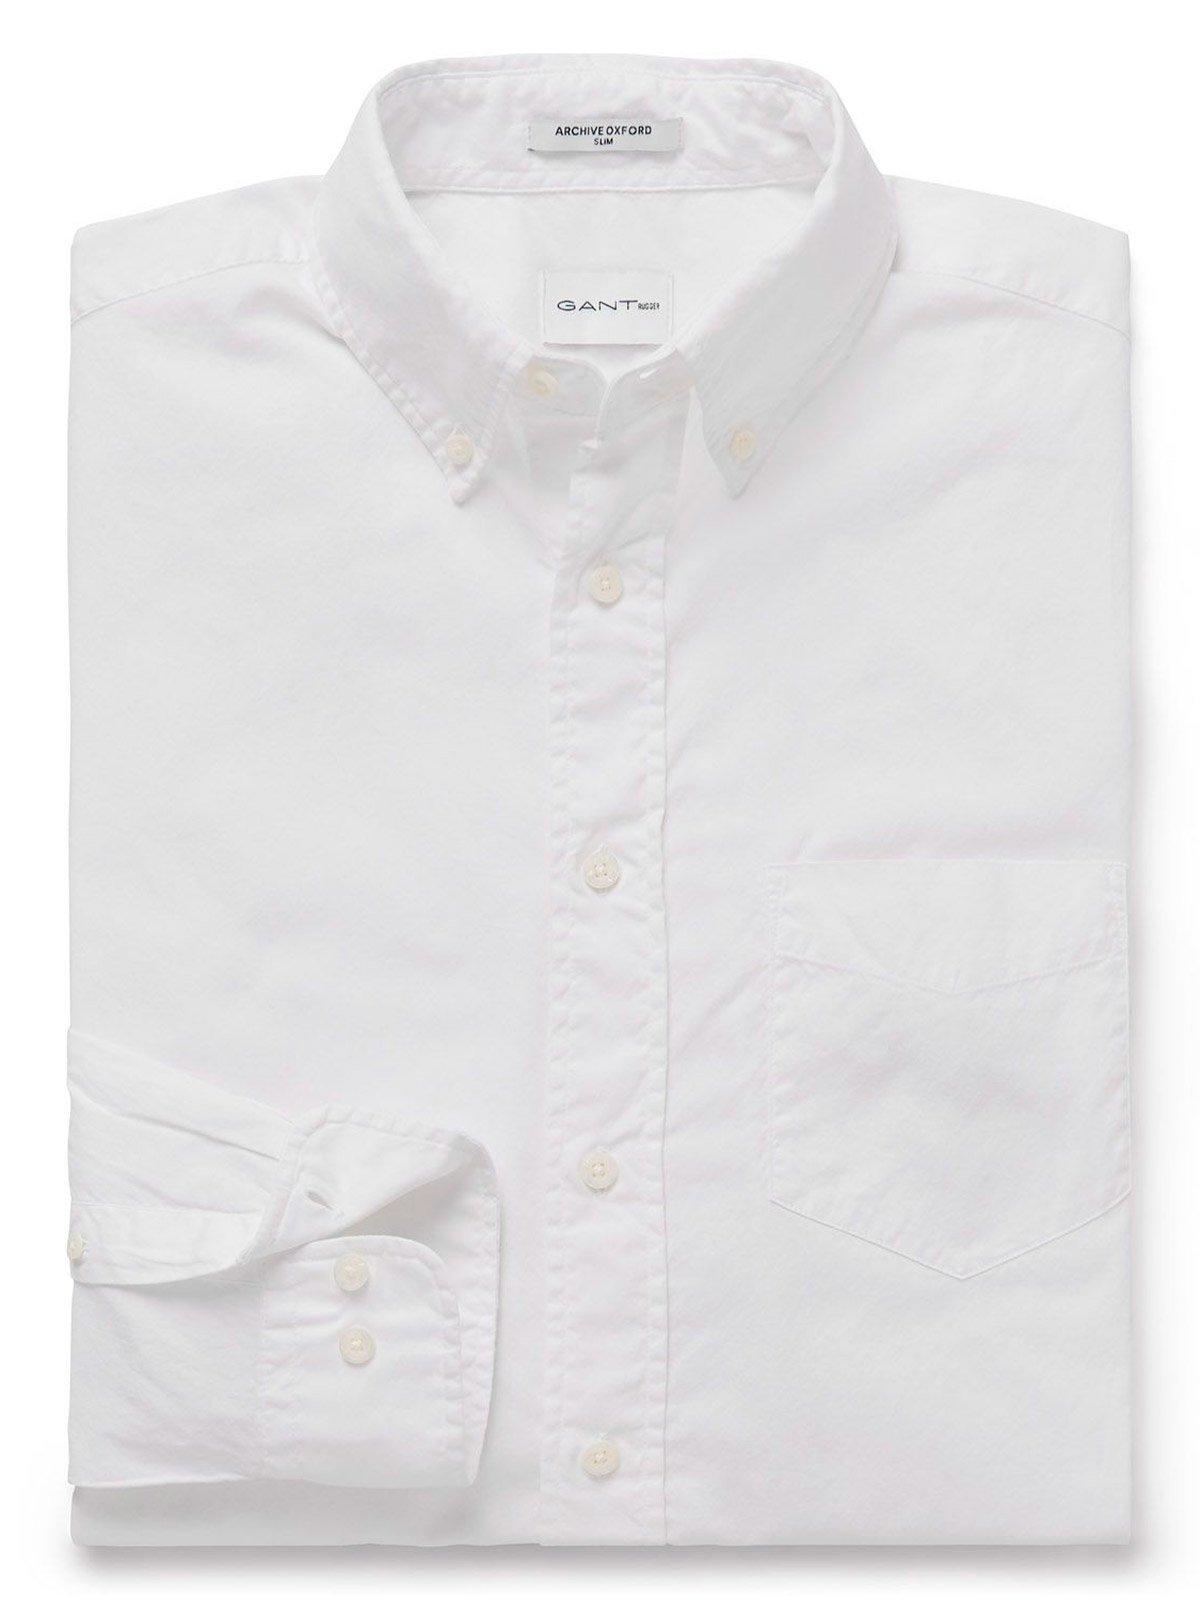 GANT Men's 18013082632110 White Cotton Shirt by GANT (Image #1)